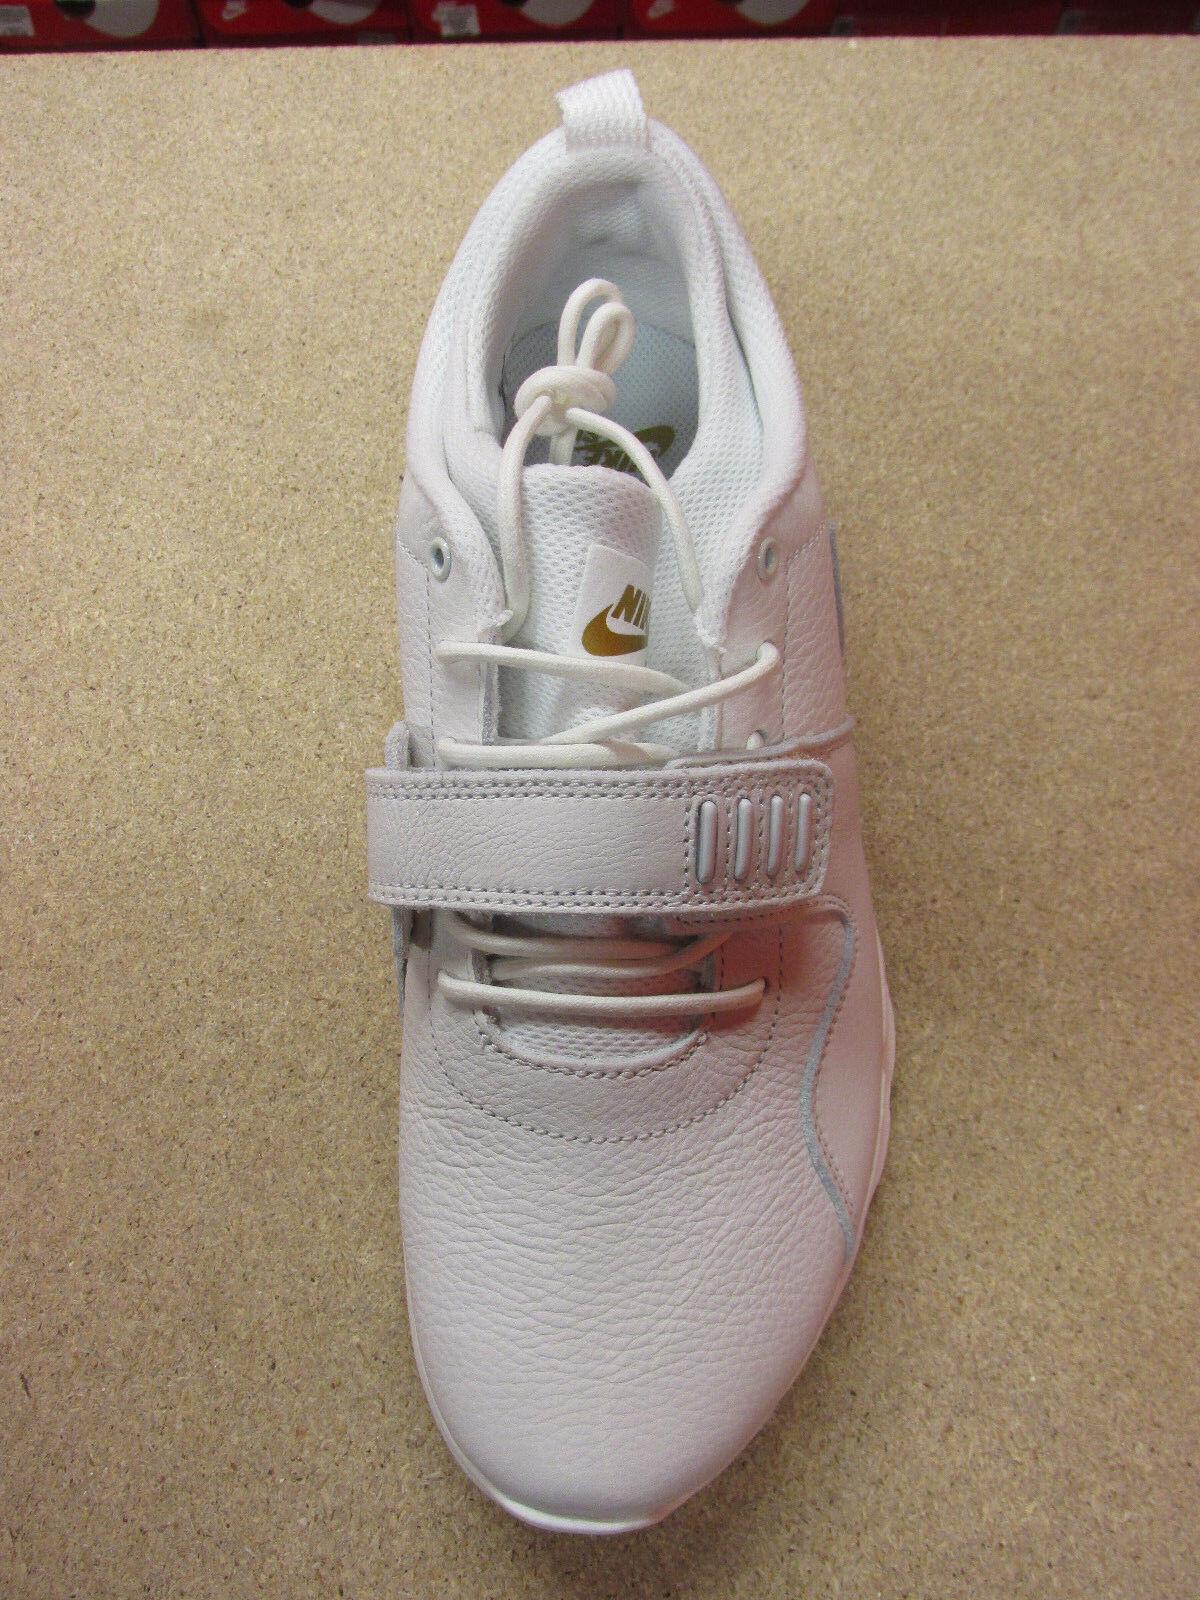 nike trainerendor prem     formateurs 812975 144 chaussures chaussures b40b61